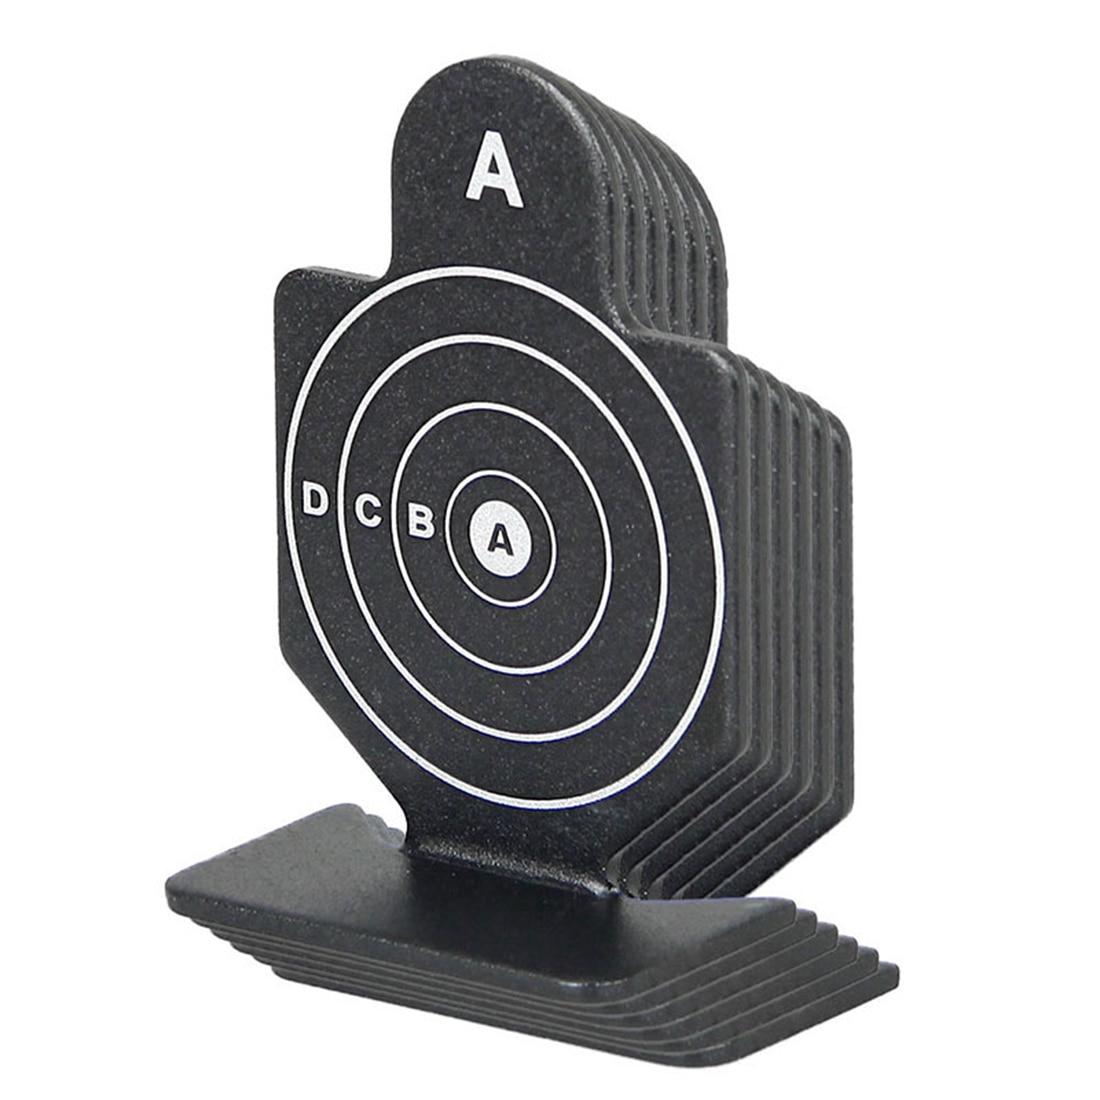 Mini Metal Airsoft Shooting Target Outdoor Hunting Game Target Shooting Training Tools - ...